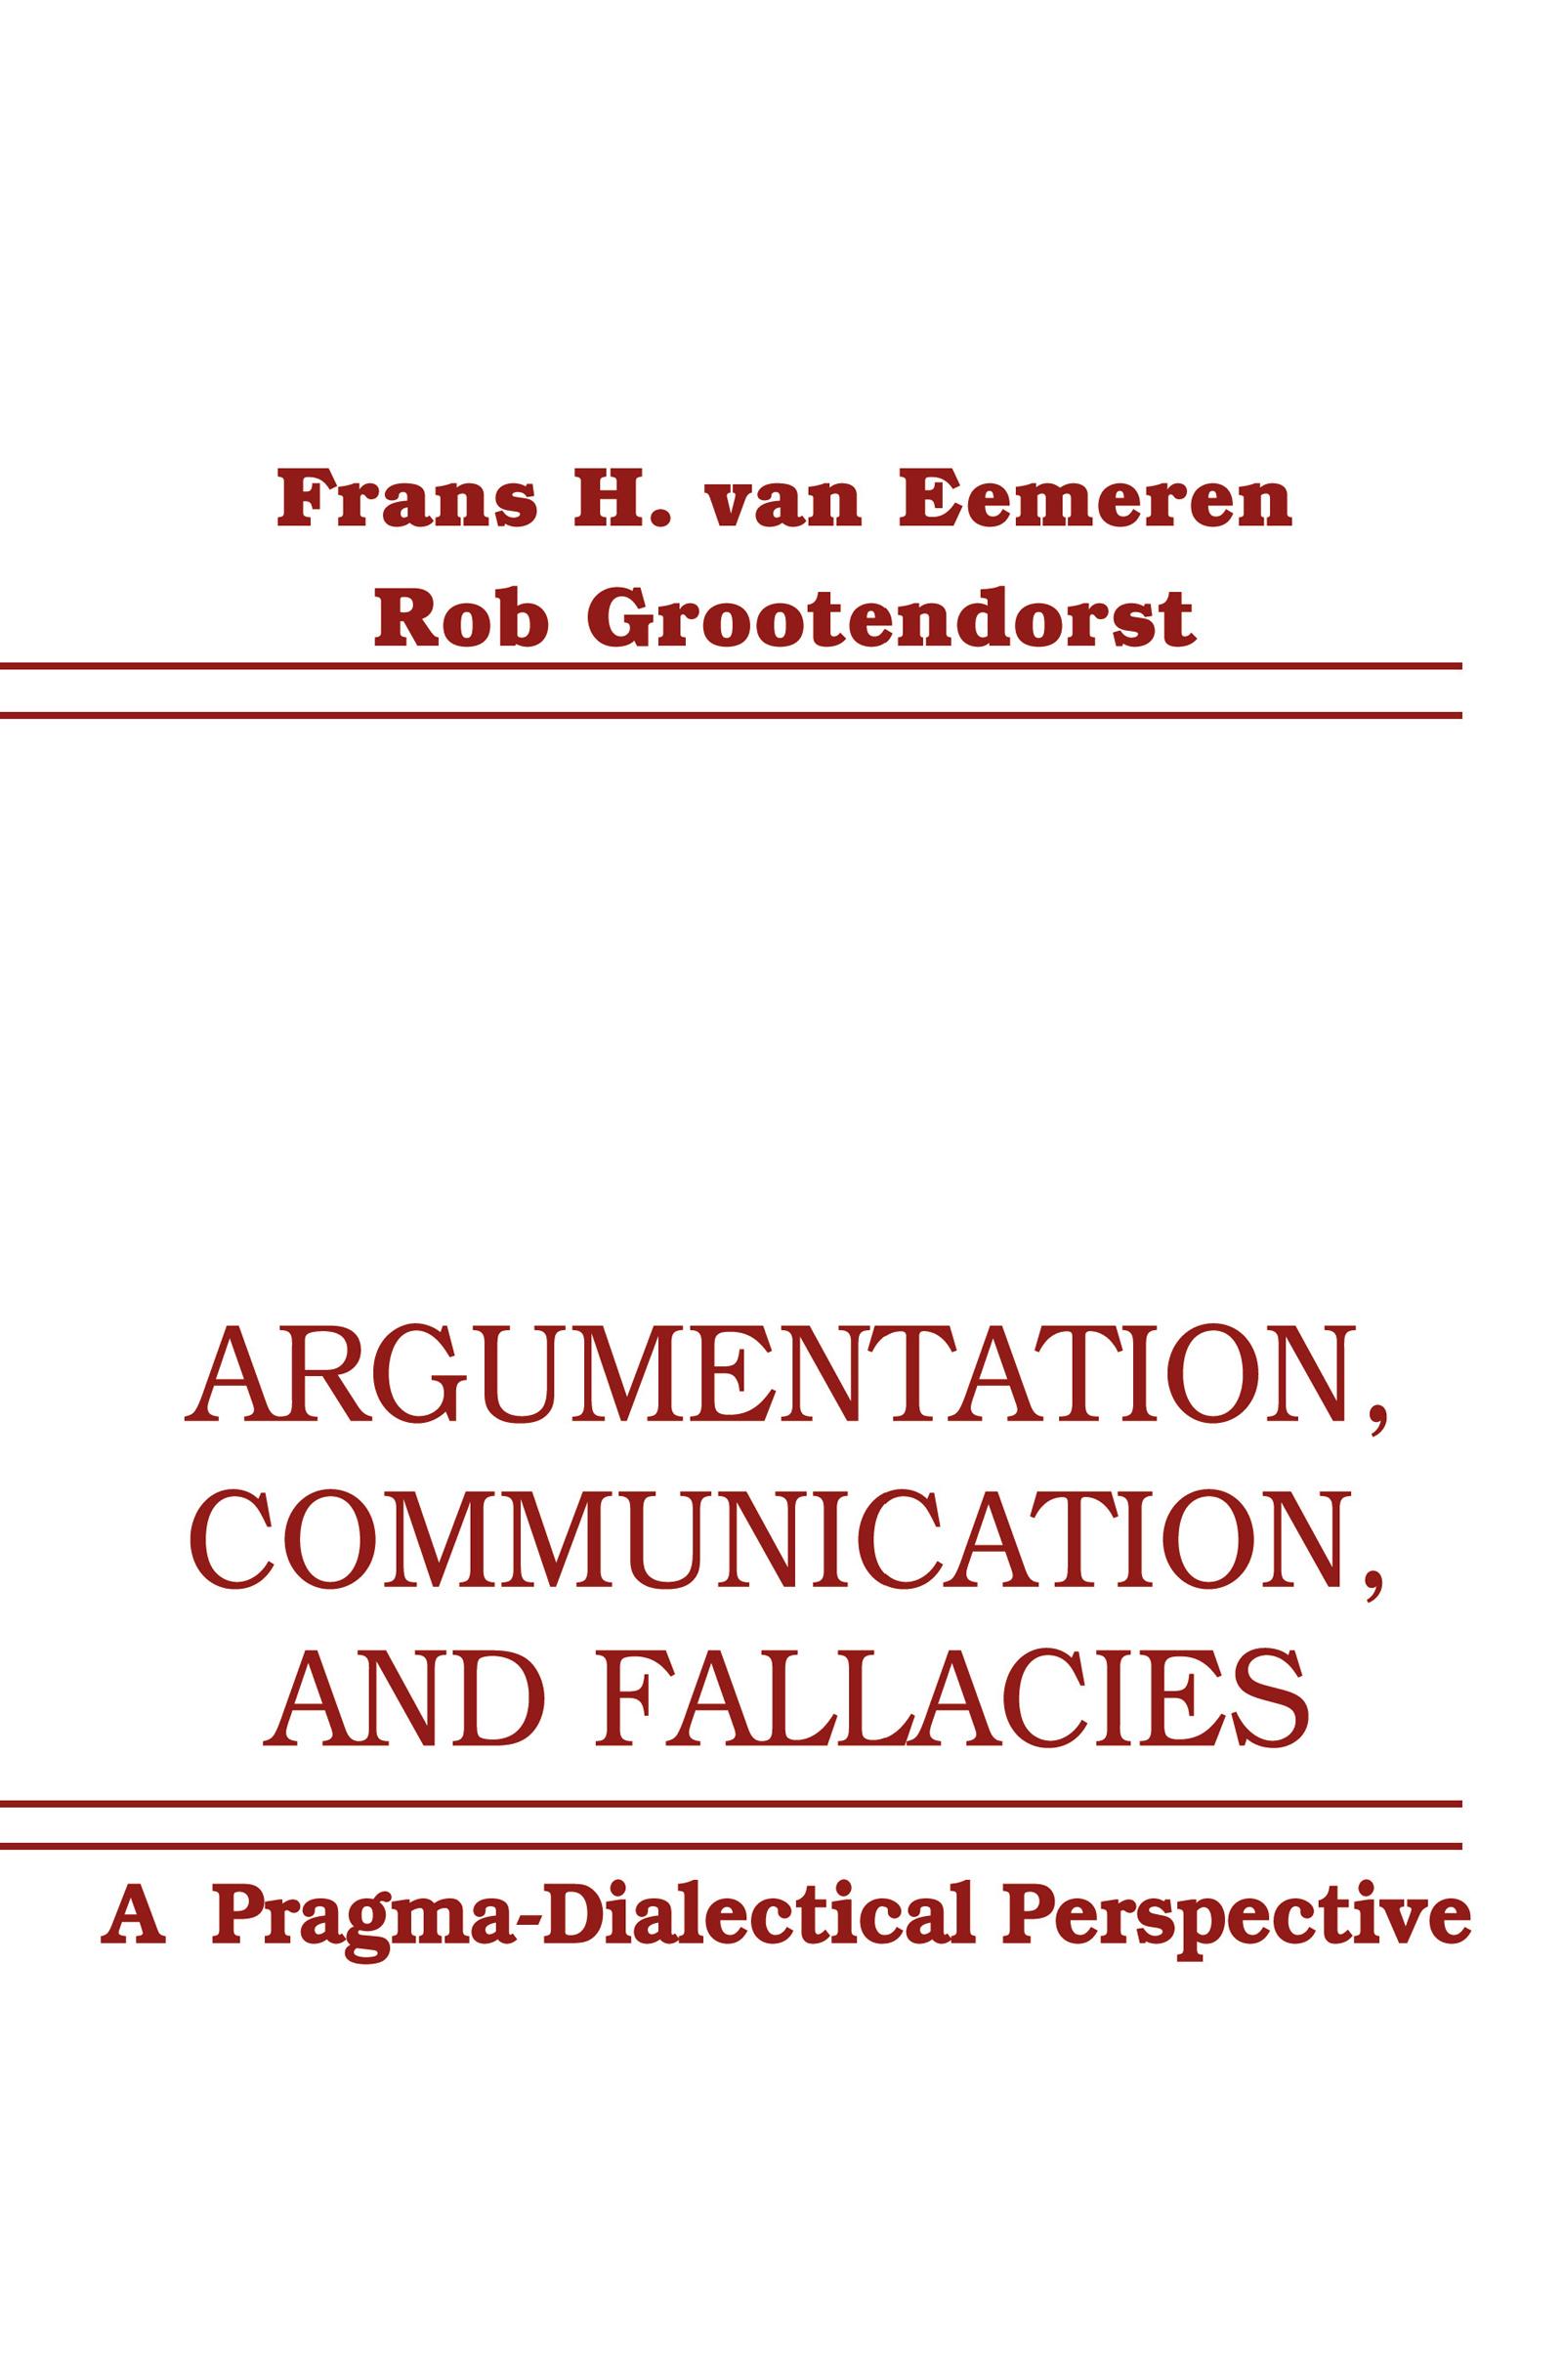 Argumentation, Communication, and Fallacies